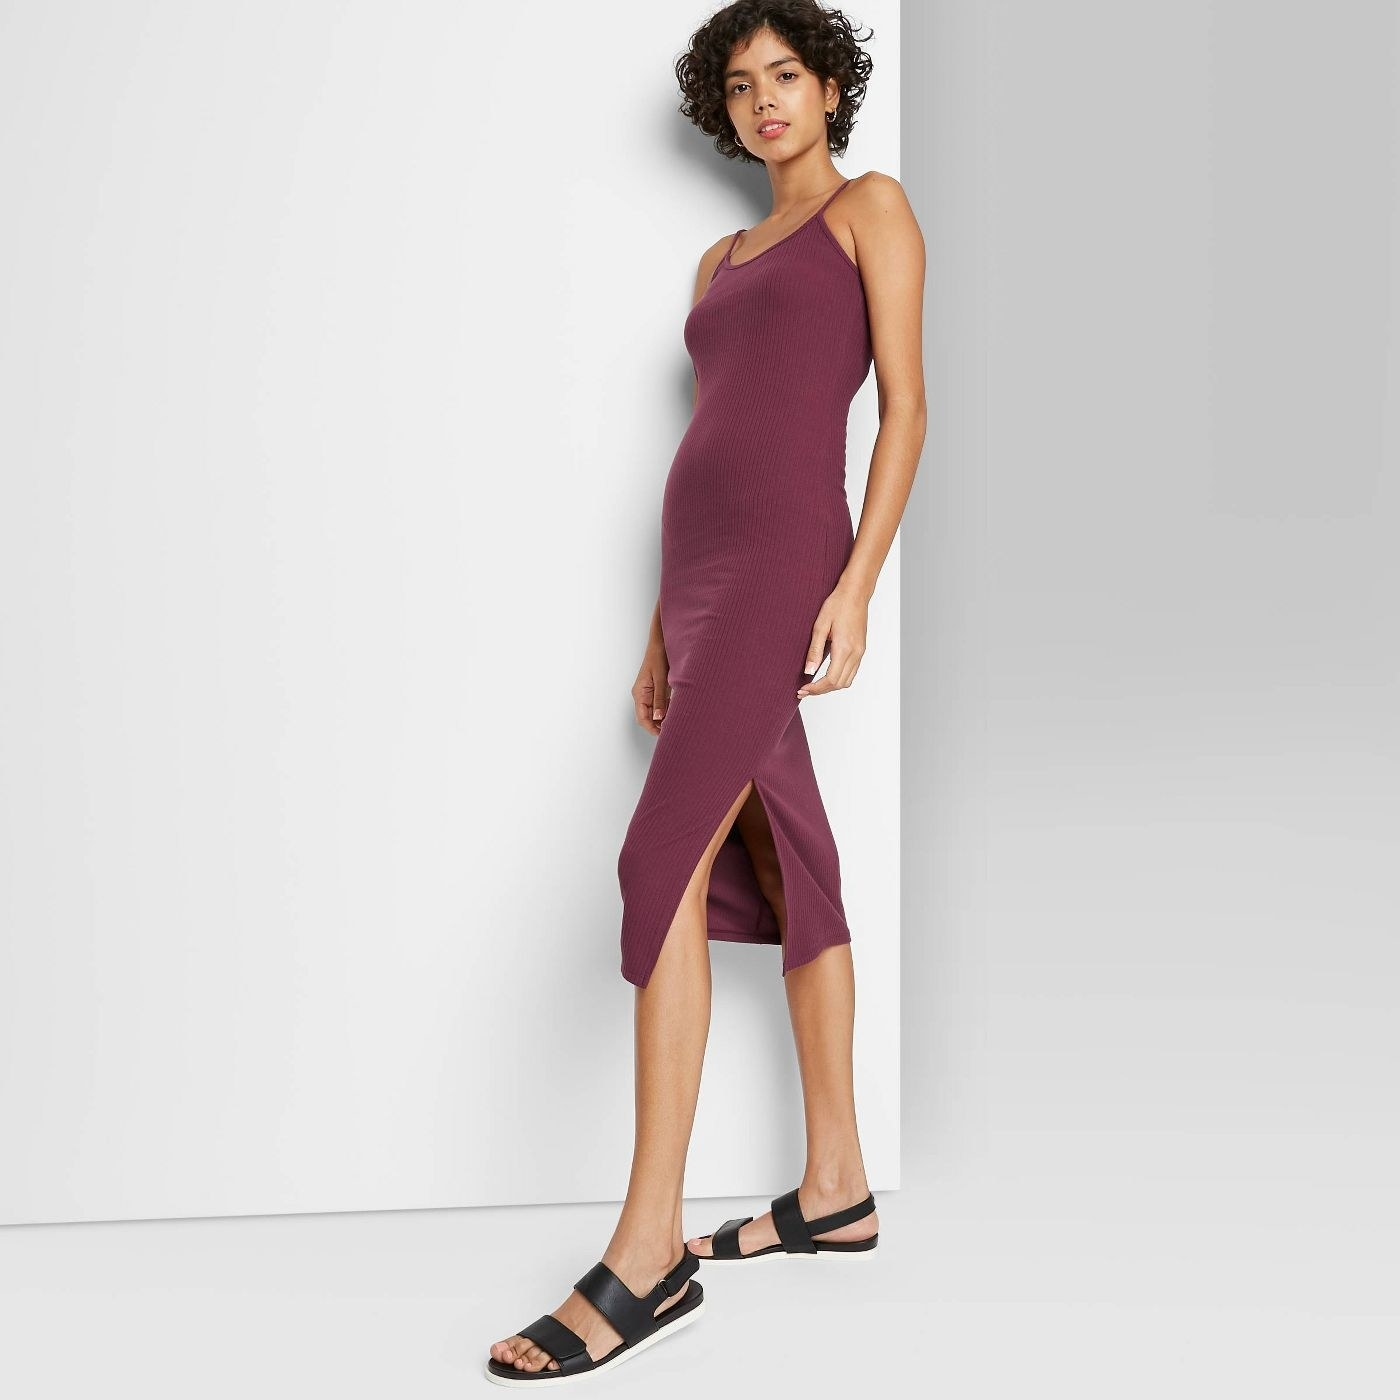 Model wearing  purple spaghetti strap dress with side slit